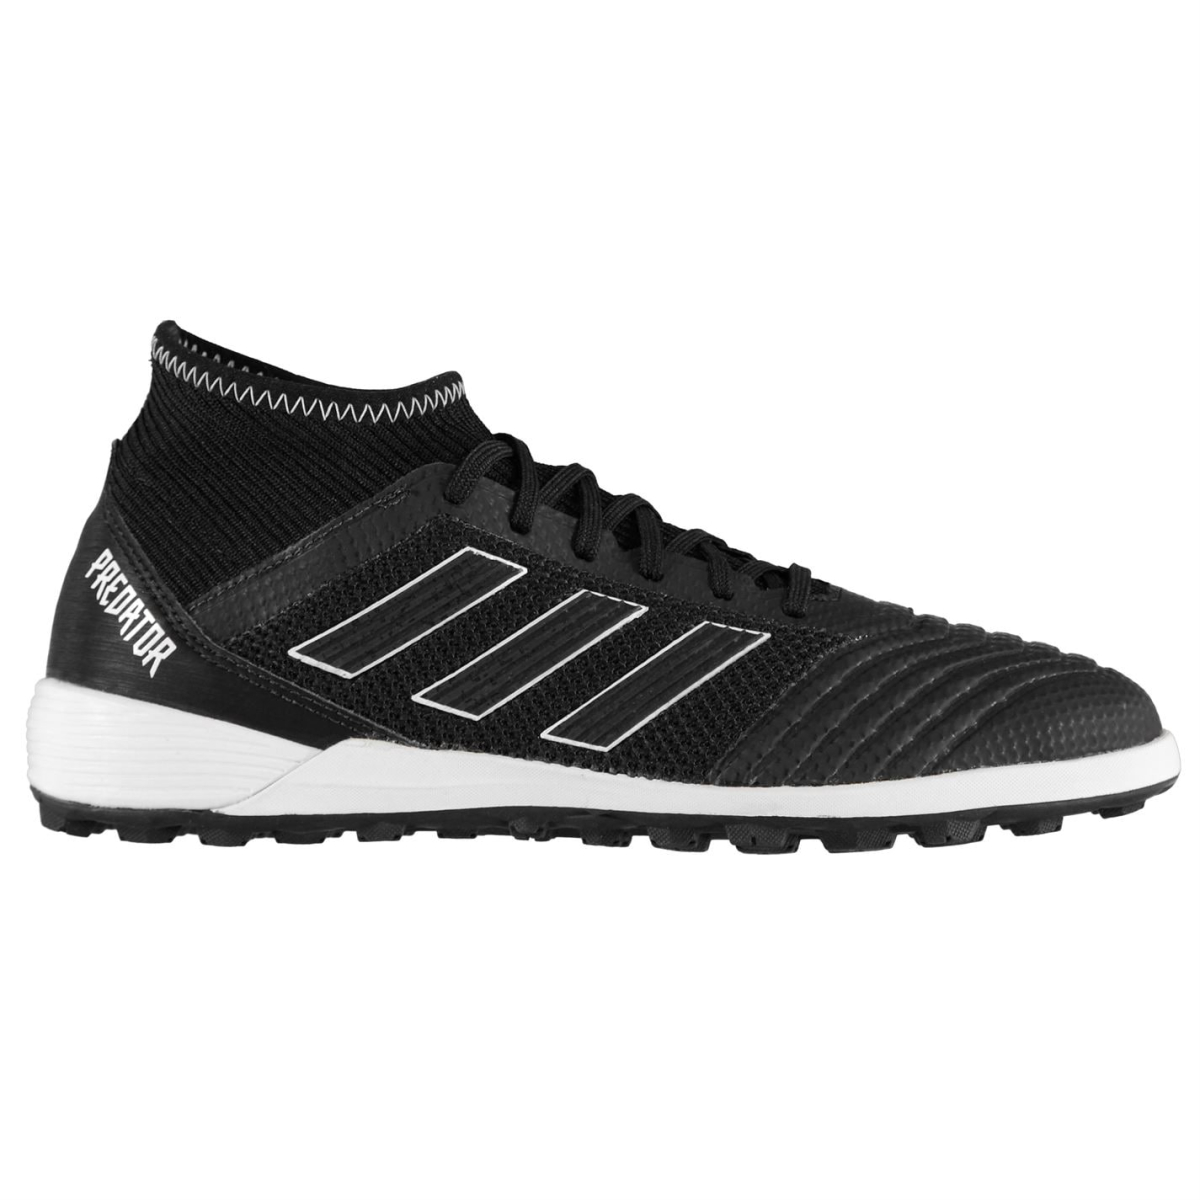 adidas Predator Tango 18.3 Herren AT Astro Turf Kunstrasen Fußballschuhe